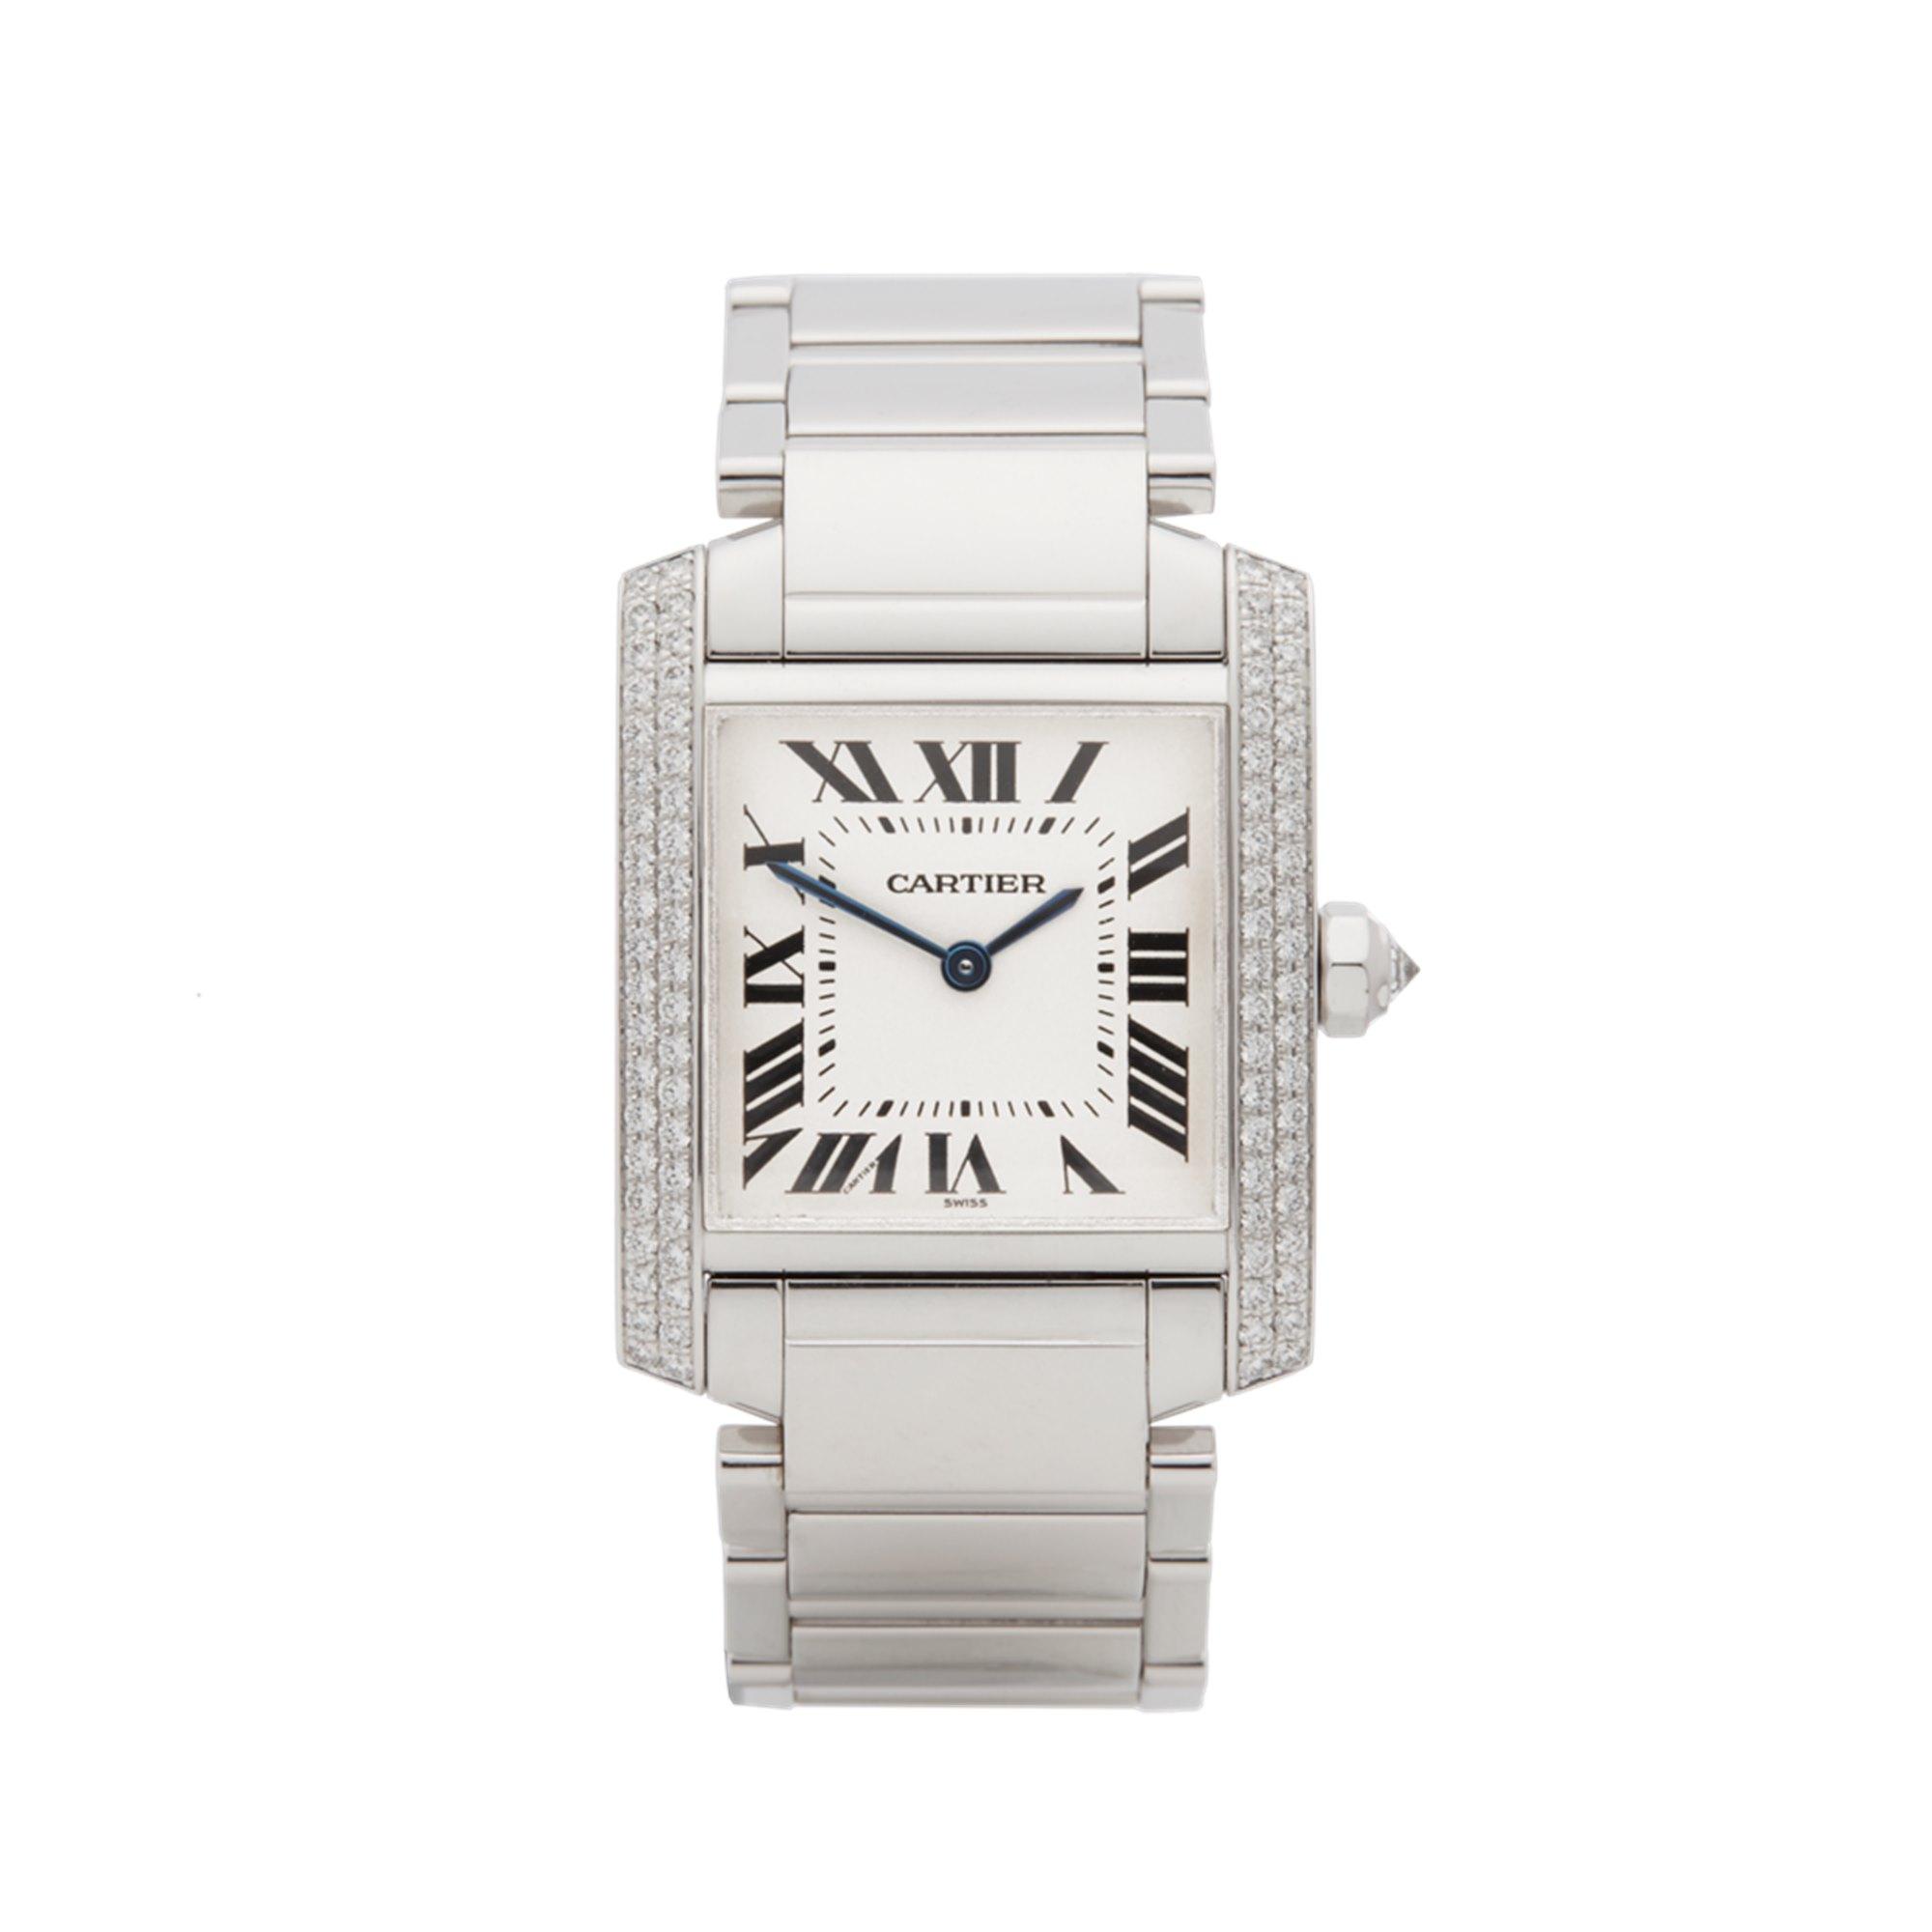 Cartier Tank Francaise Diamond 18K White Gold WE1009S3 or 2404MG